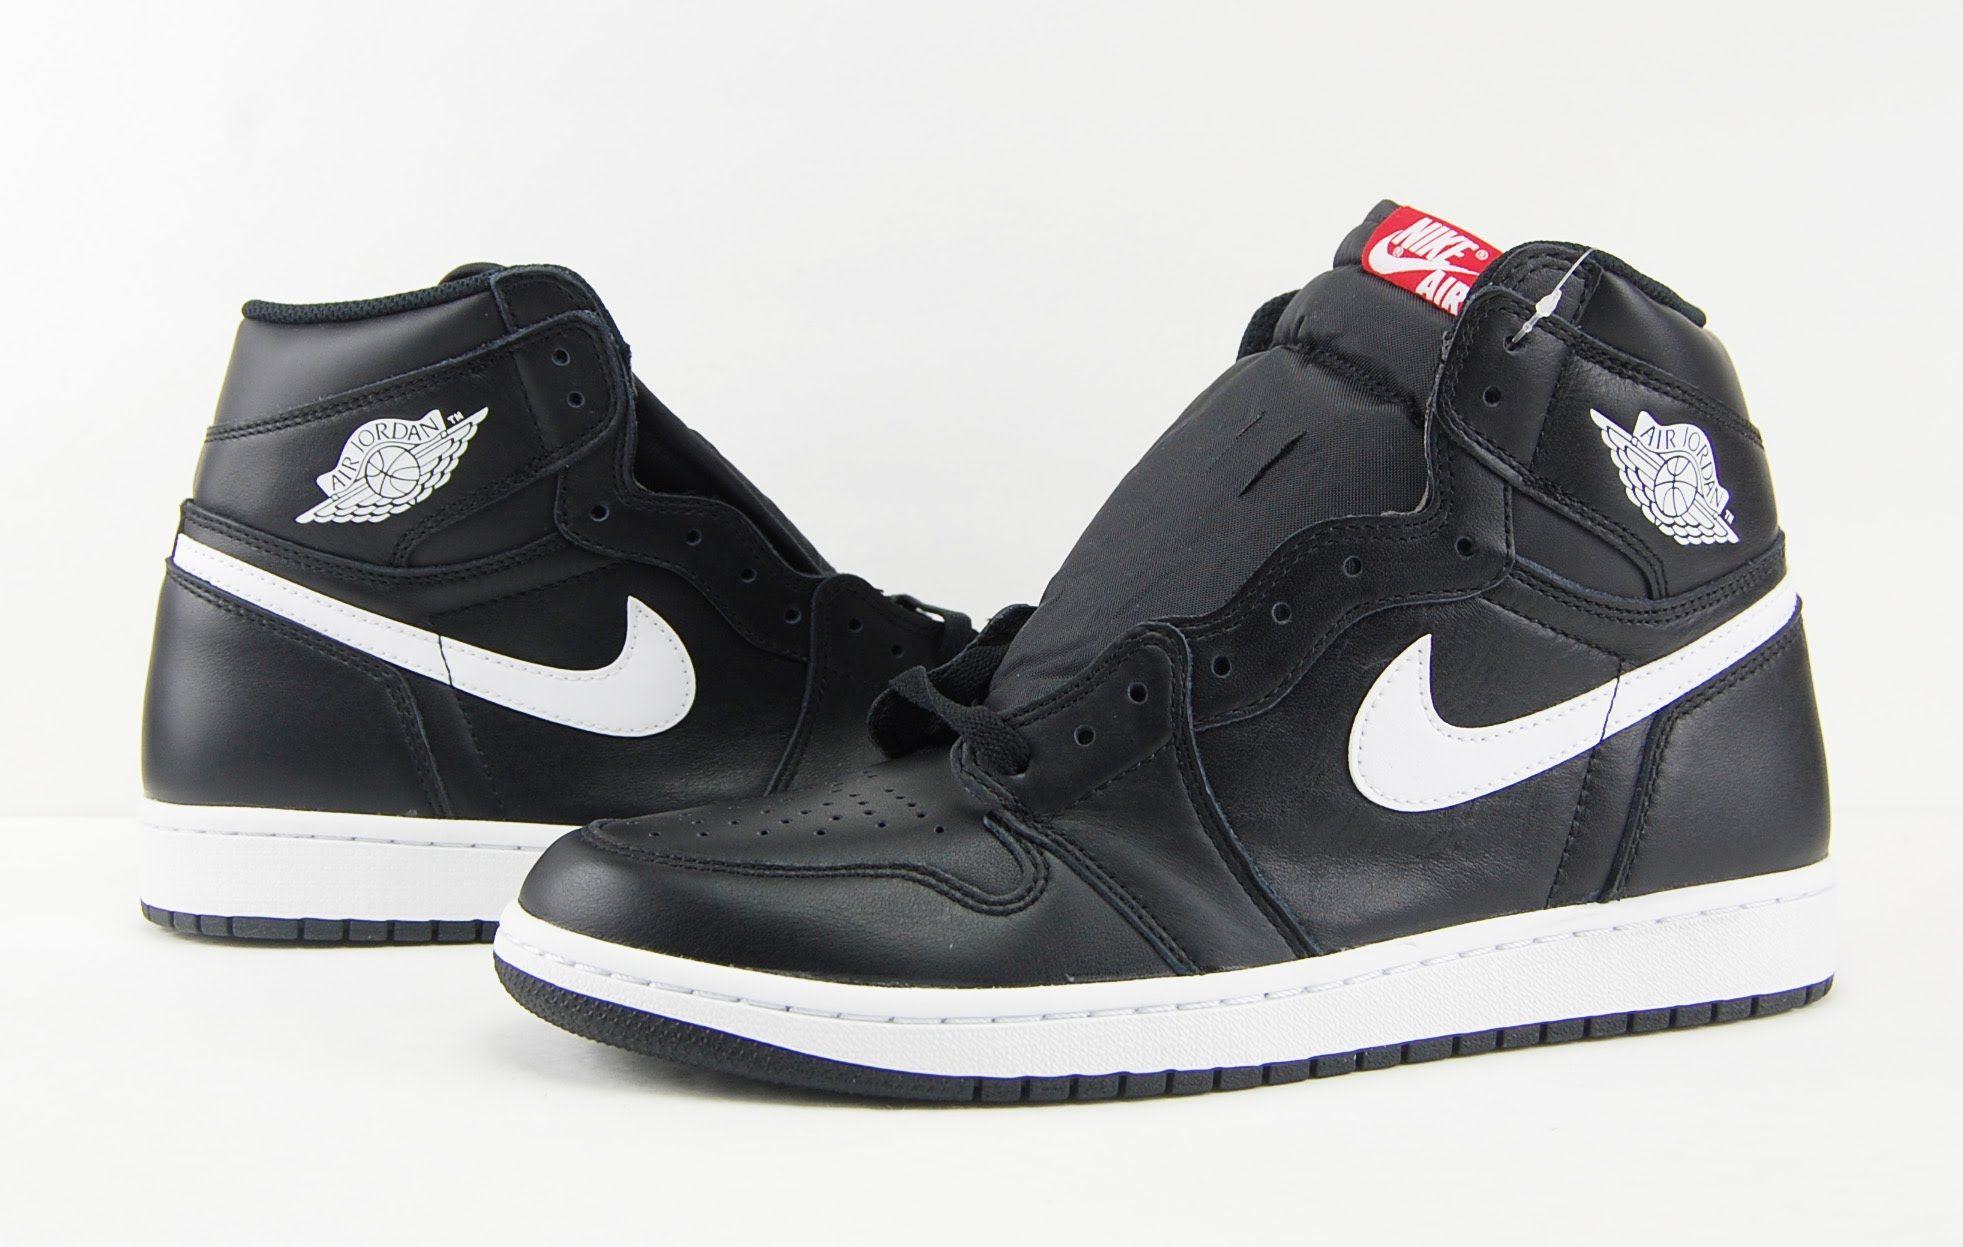 Air Jordan 1 High Retro OG Black White Yin Yang Premium Essentials Pack  Review + On Feet 67cfe05f7